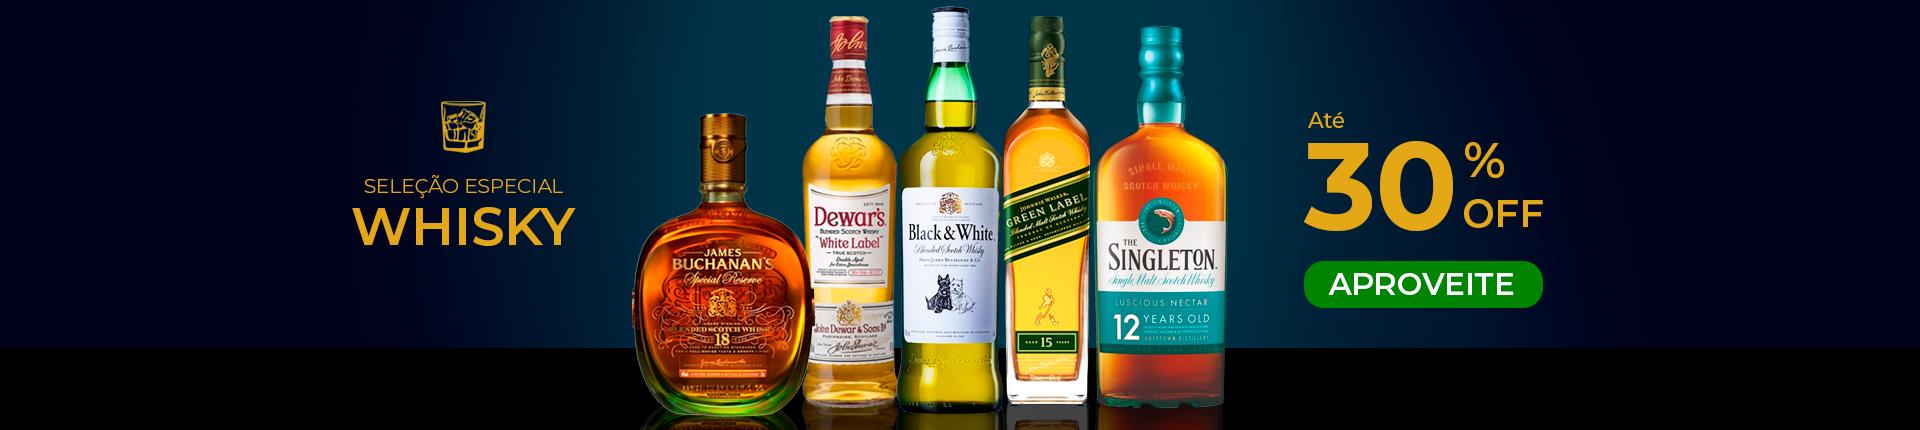 Desktop | Whisky NOVO SITE